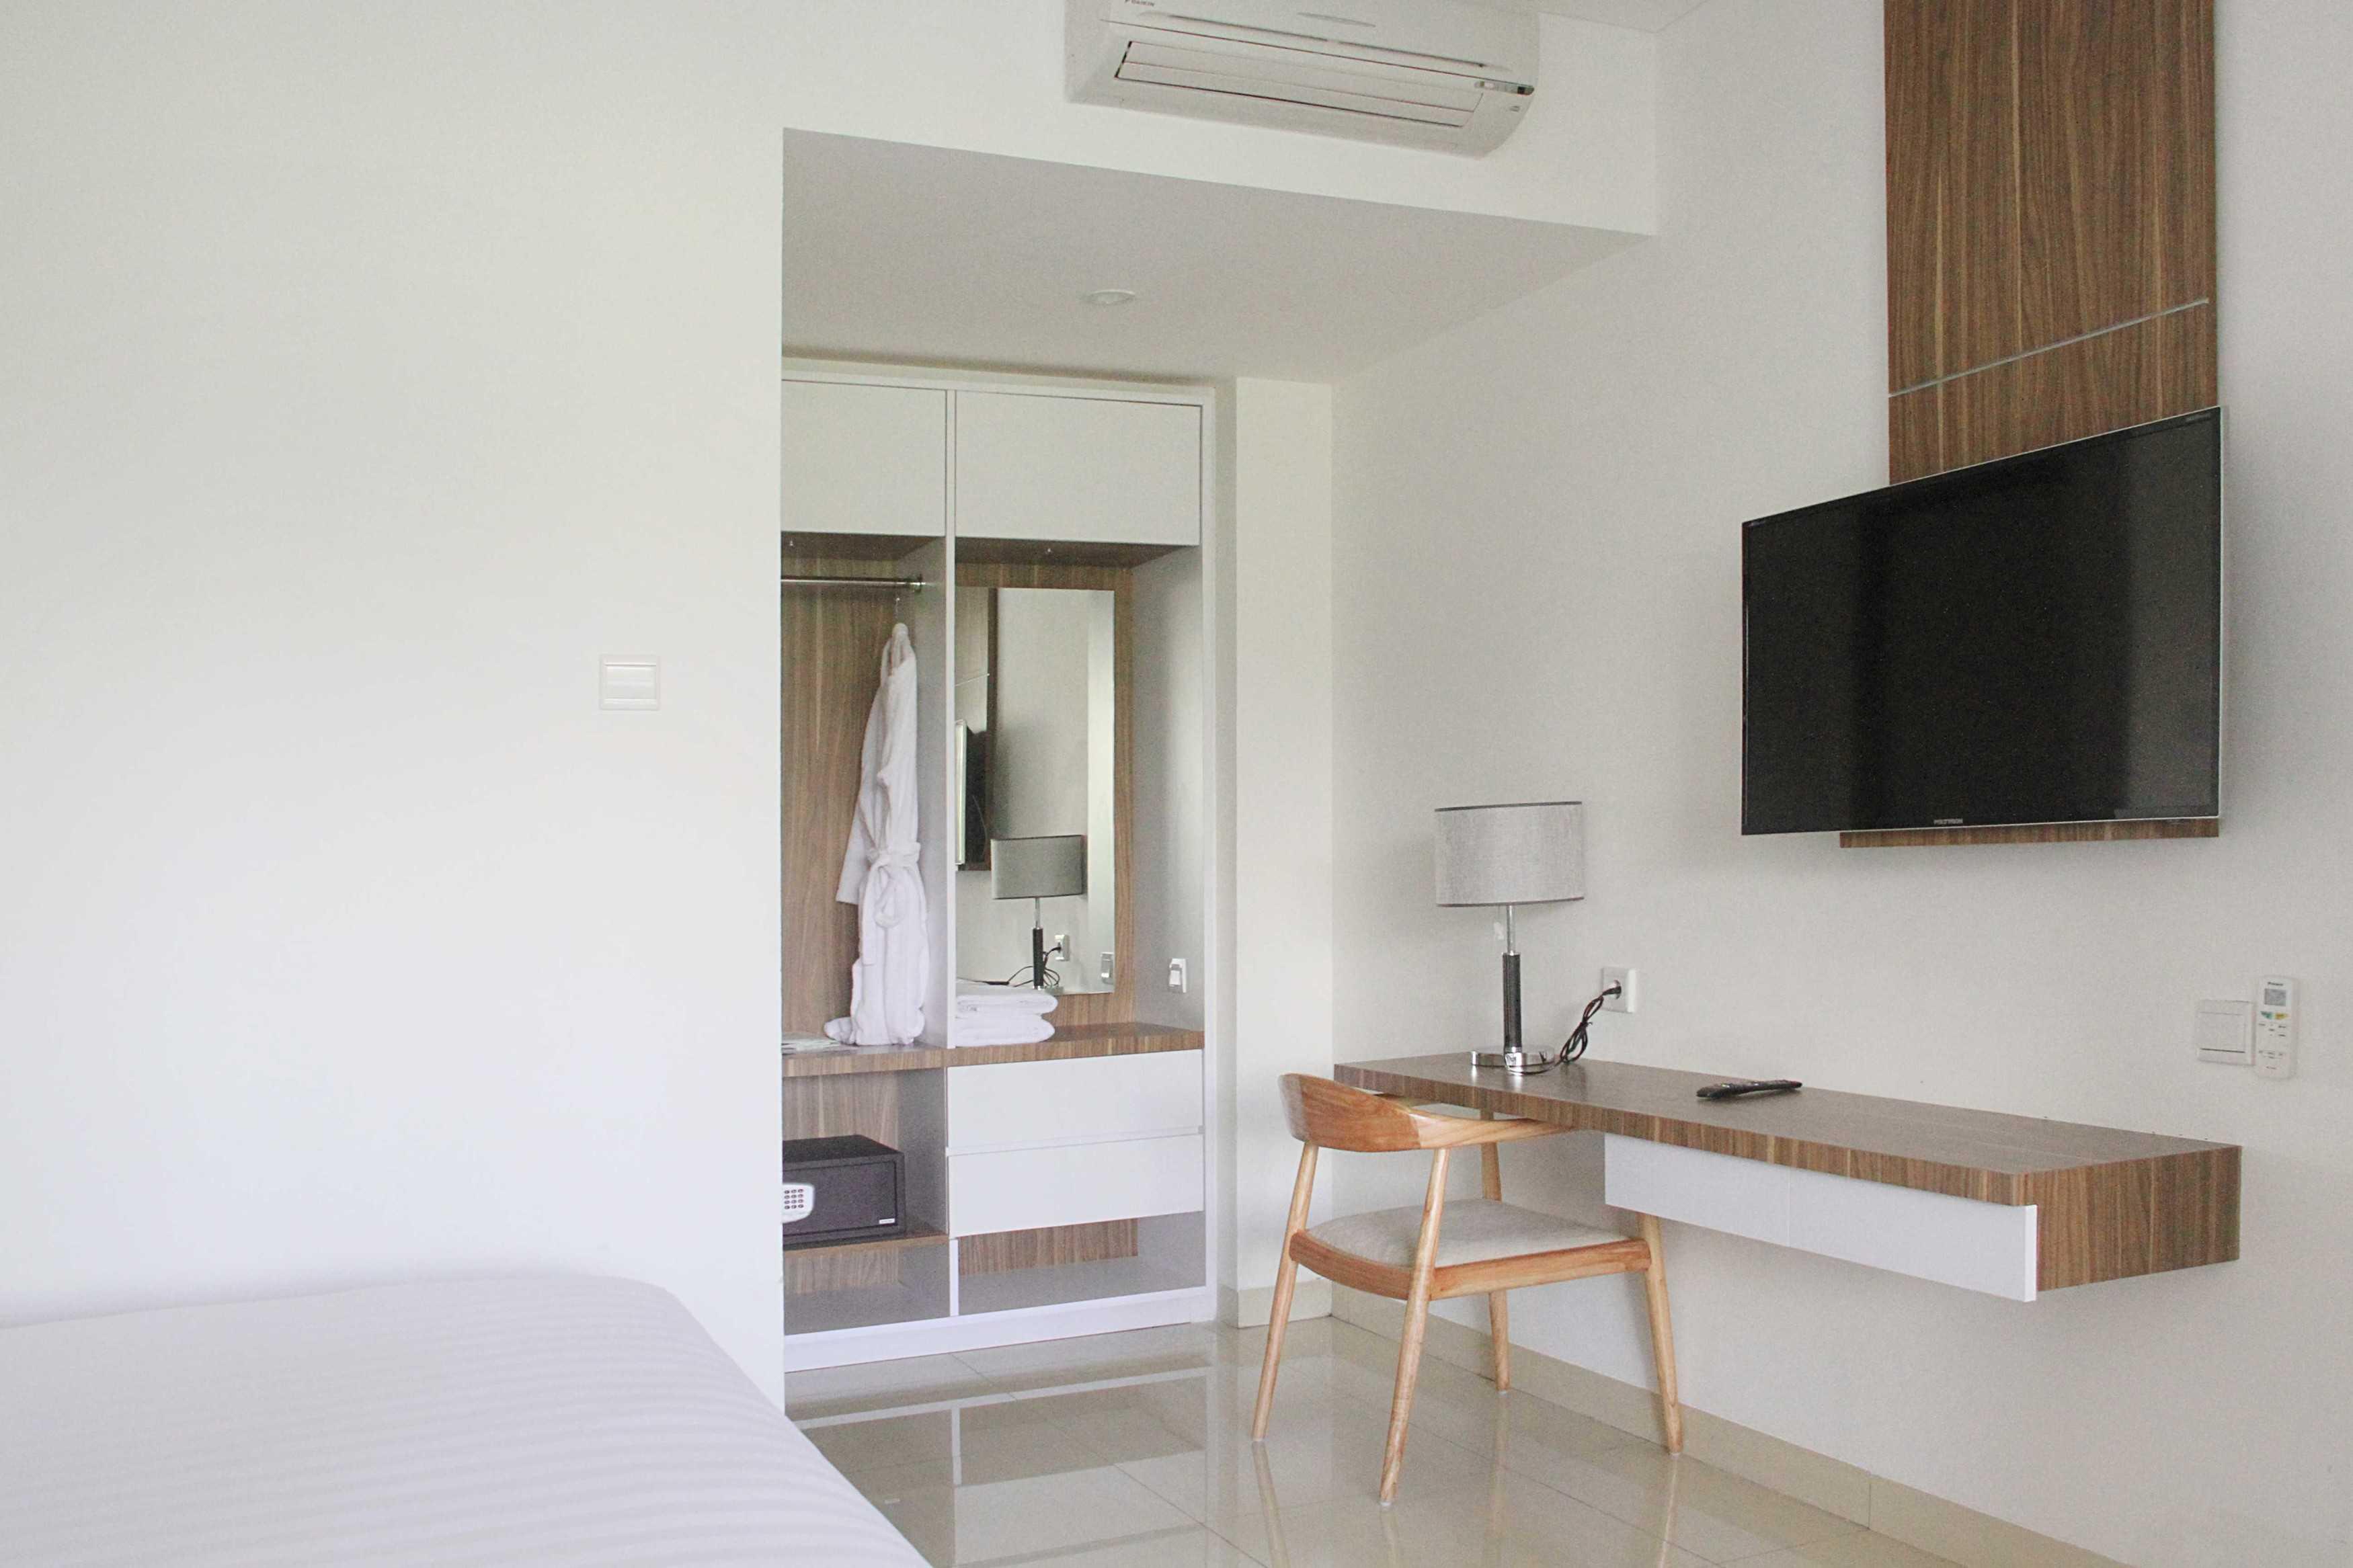 Arkitekt.id Executive Suite Room No 1 Clove Garden Hotel, Bandung Clove Garden Hotel, Bandung Bedroom Closet Skandinavia  29450